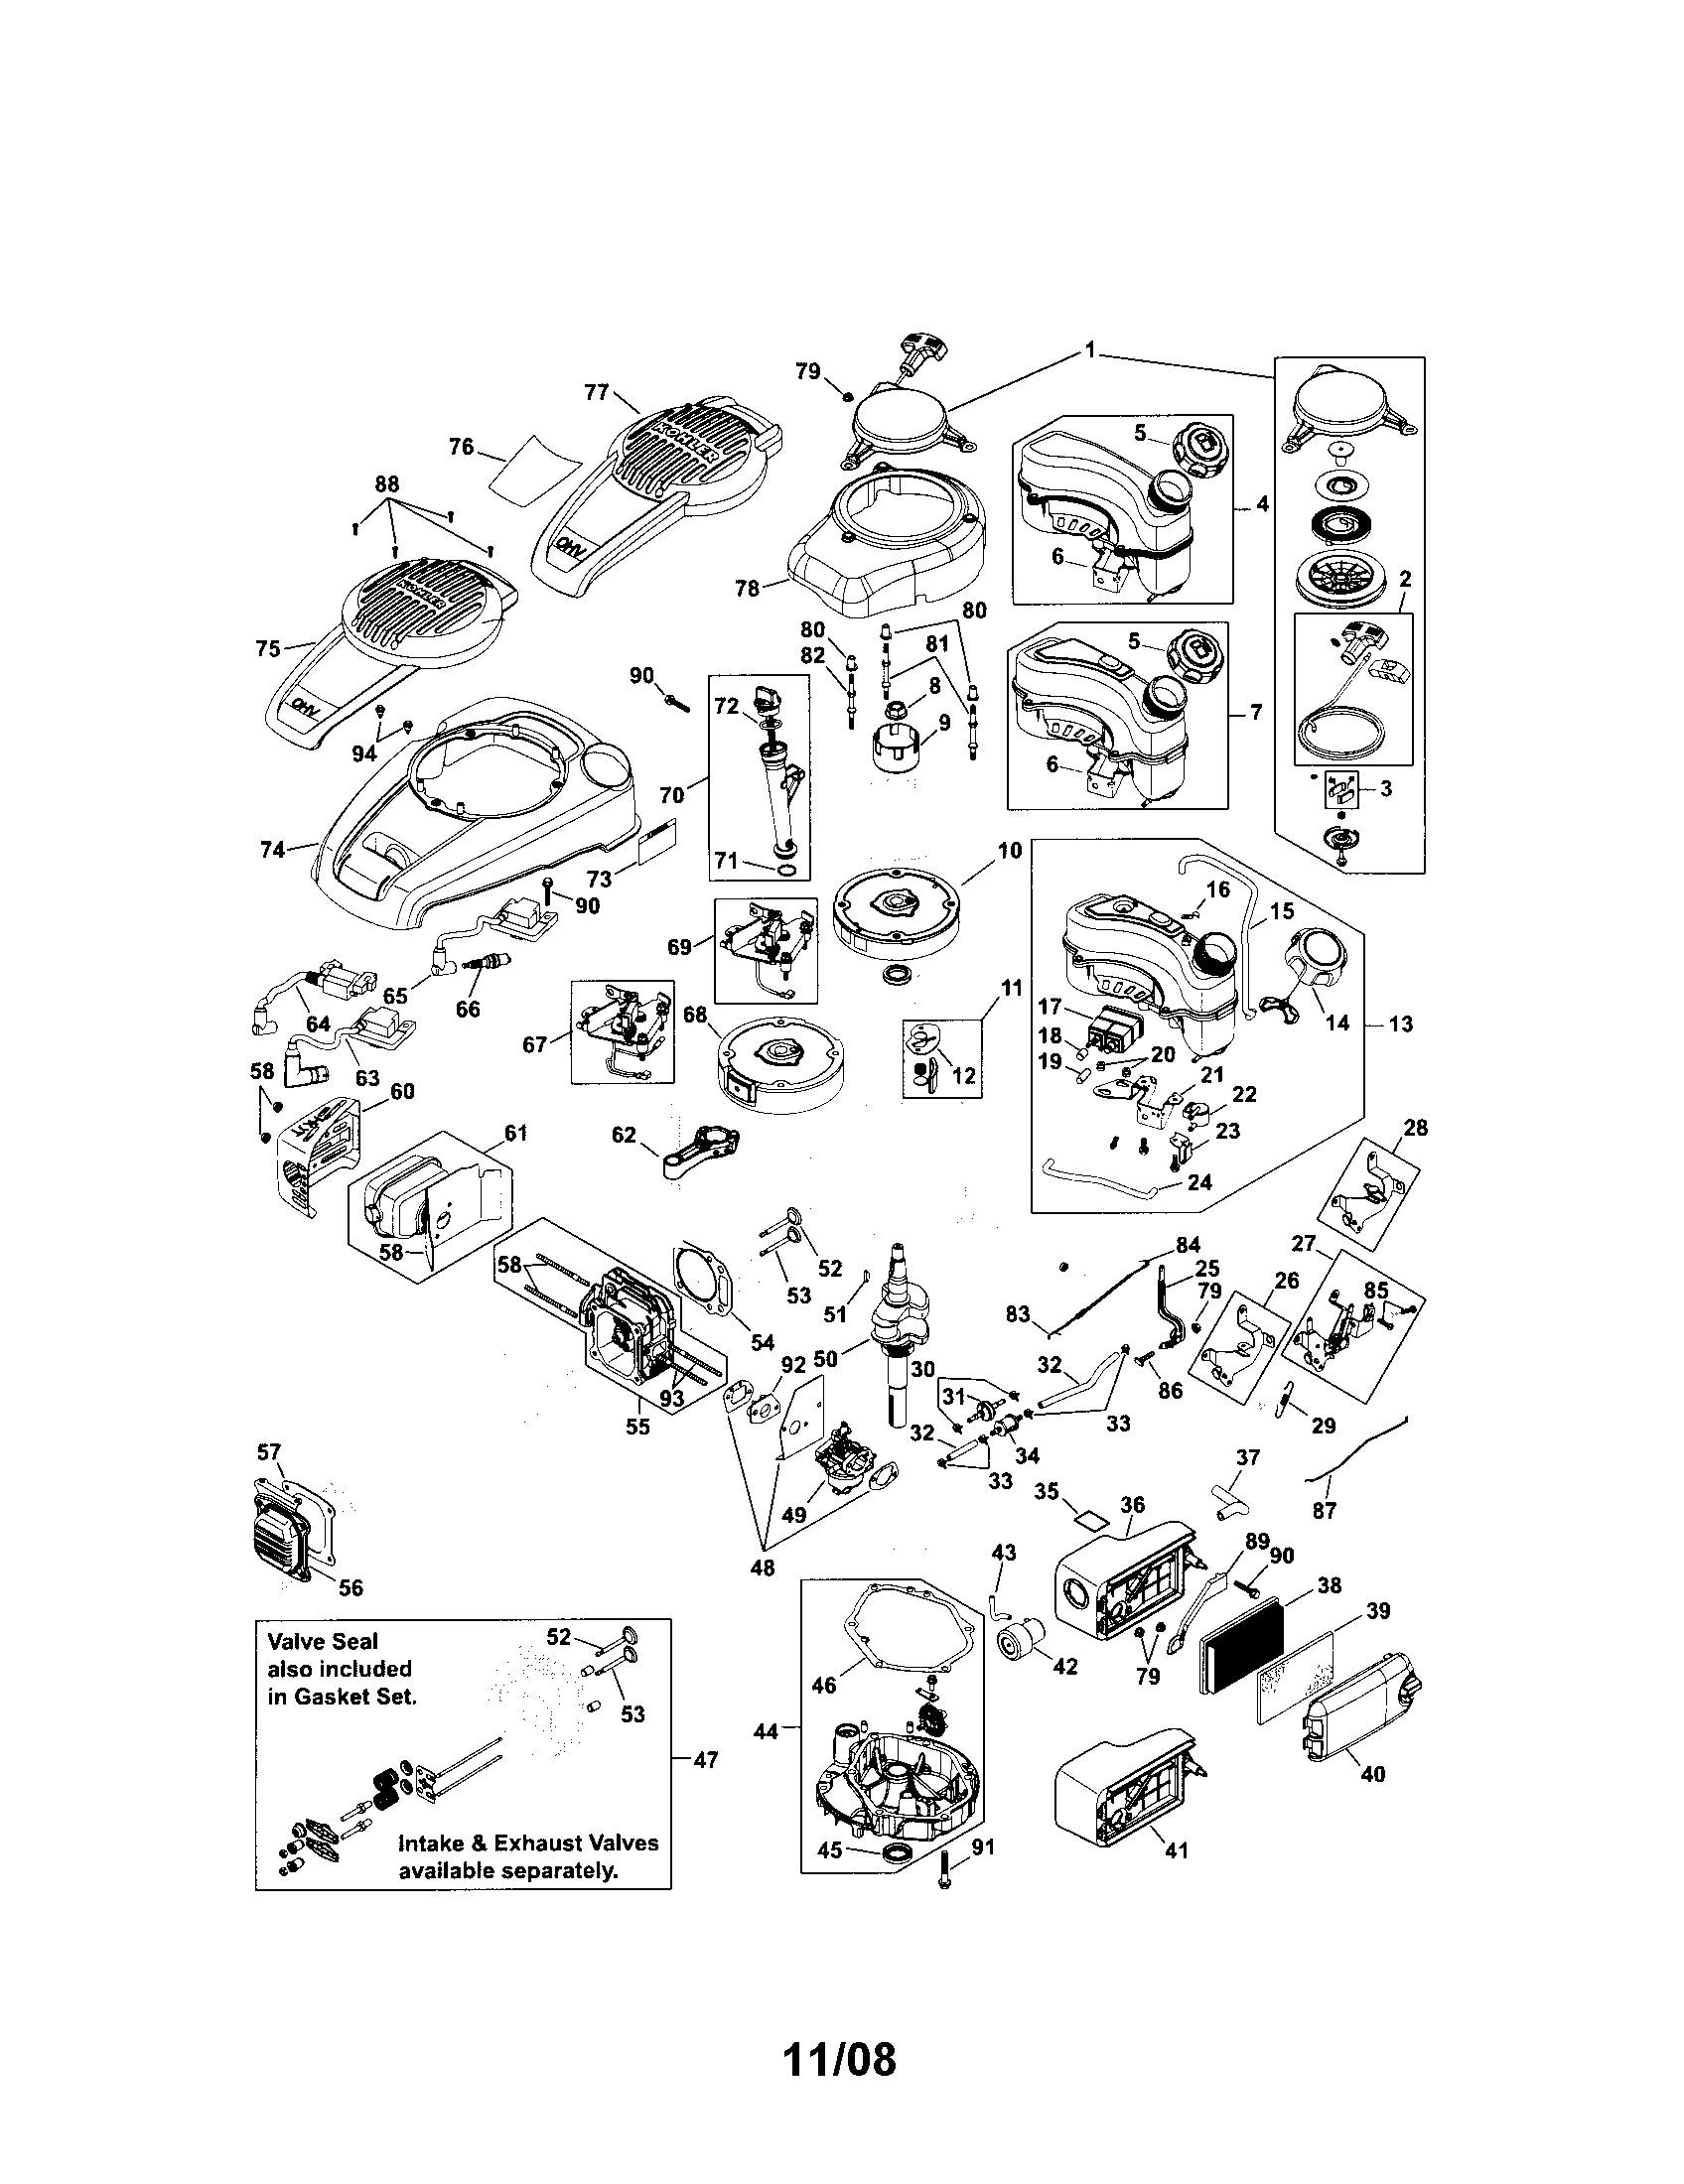 Kohler Engine Diagram Wiring Marine Starter Solenoid Chart Gallery Of